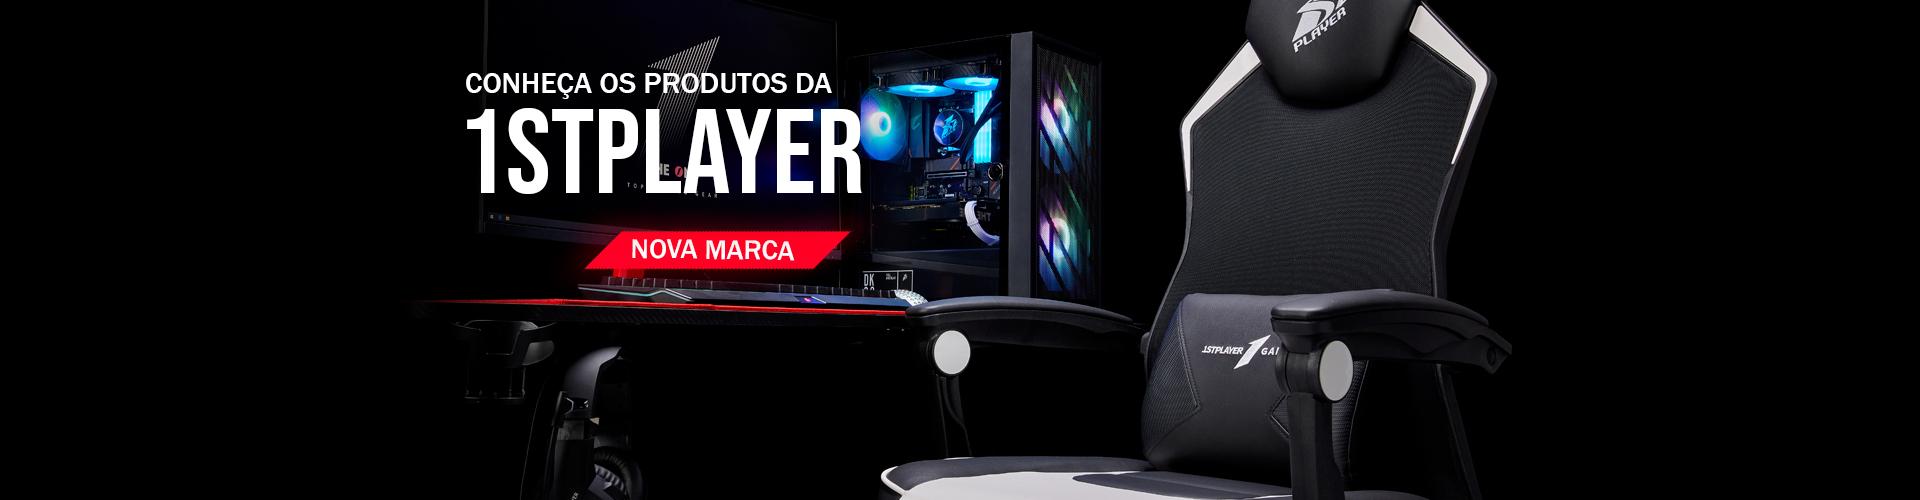 Nova Marca 1STPlayer